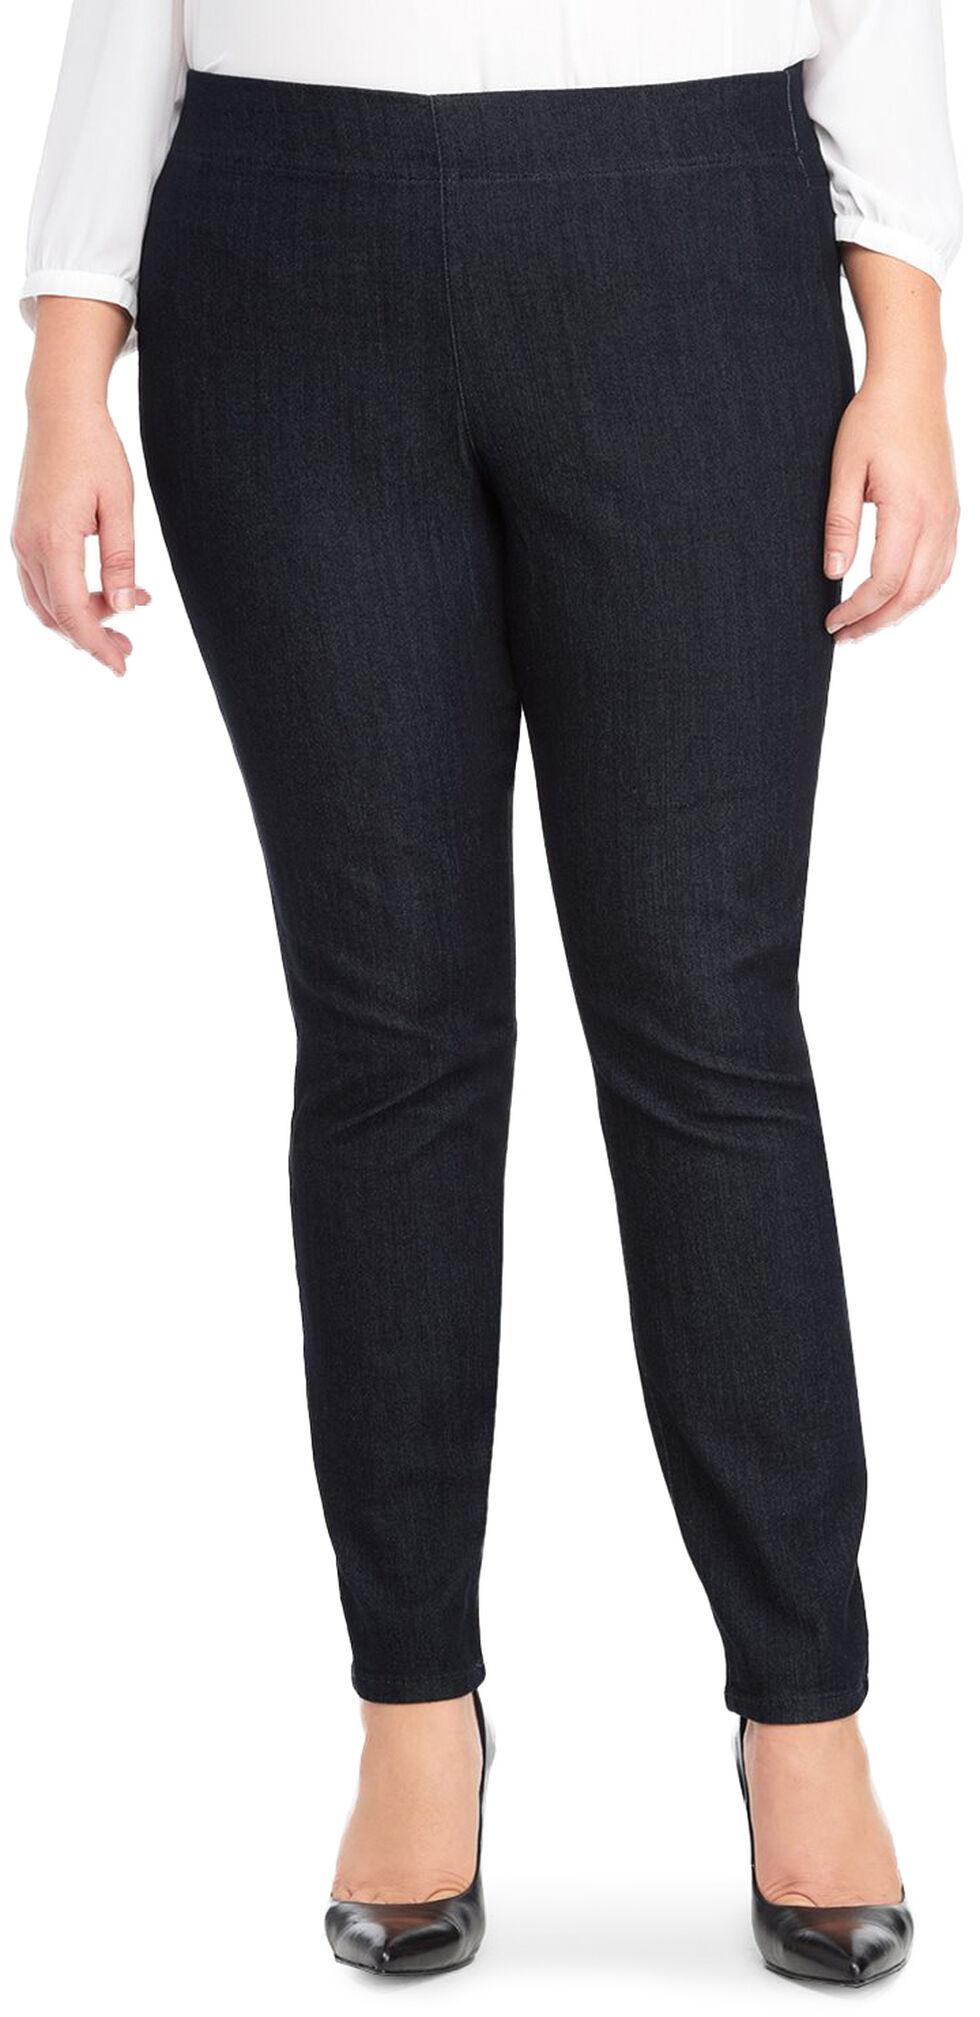 NYDJ Women's Poppy Pull-On Legging Jeans - Plus Size, Indigo, hi-res